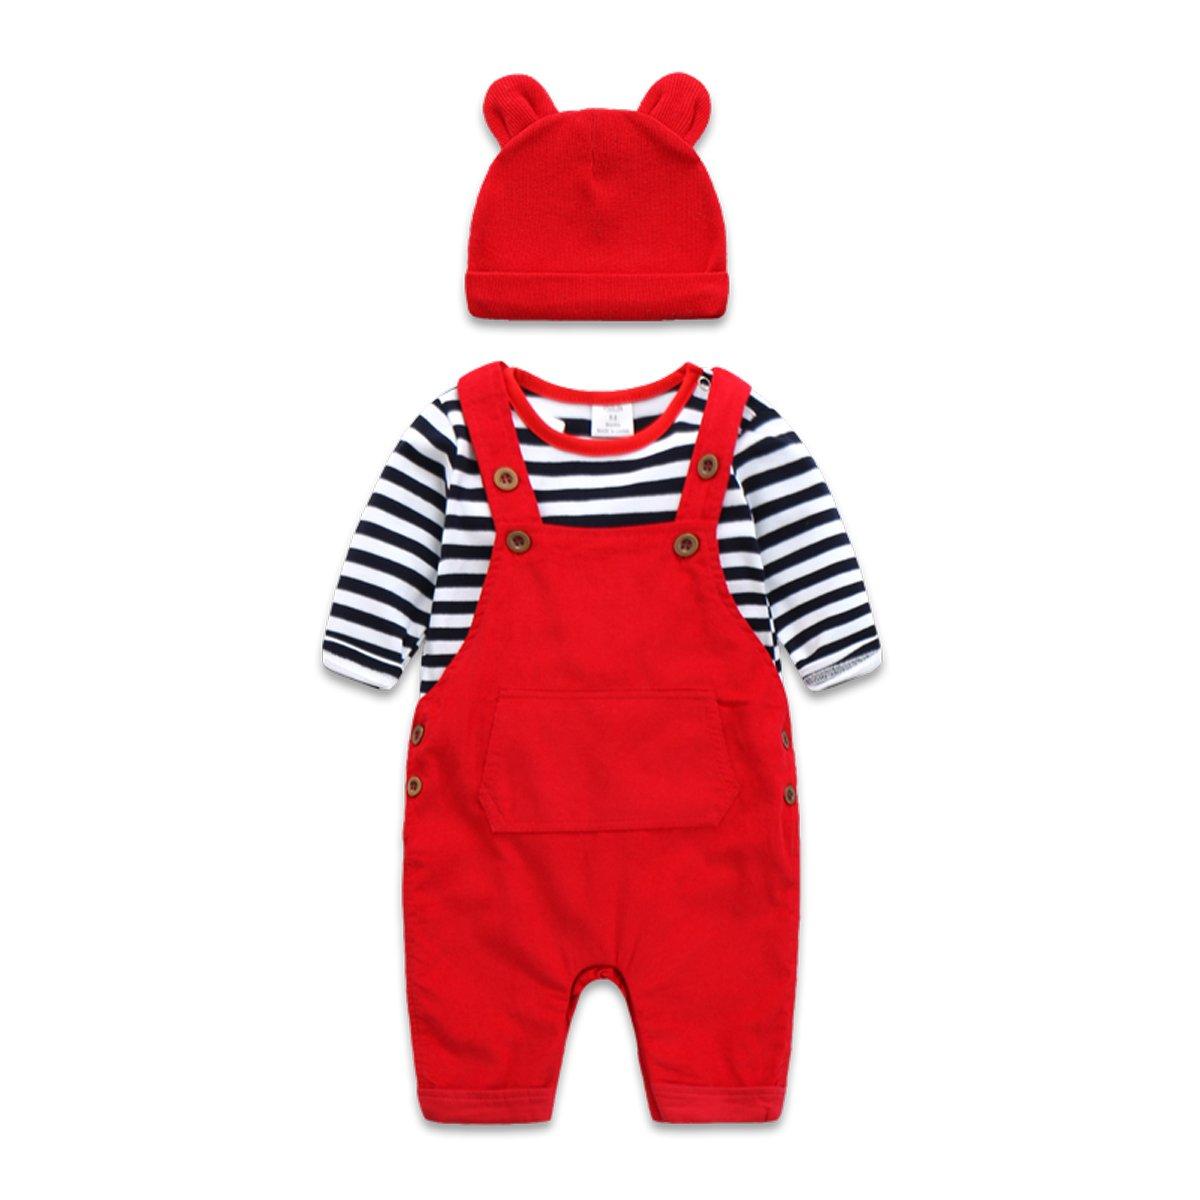 36cb56325 Amazon.com  Boarnseorl Newborn Baby Boy and Girl Clothes Set Infant ...